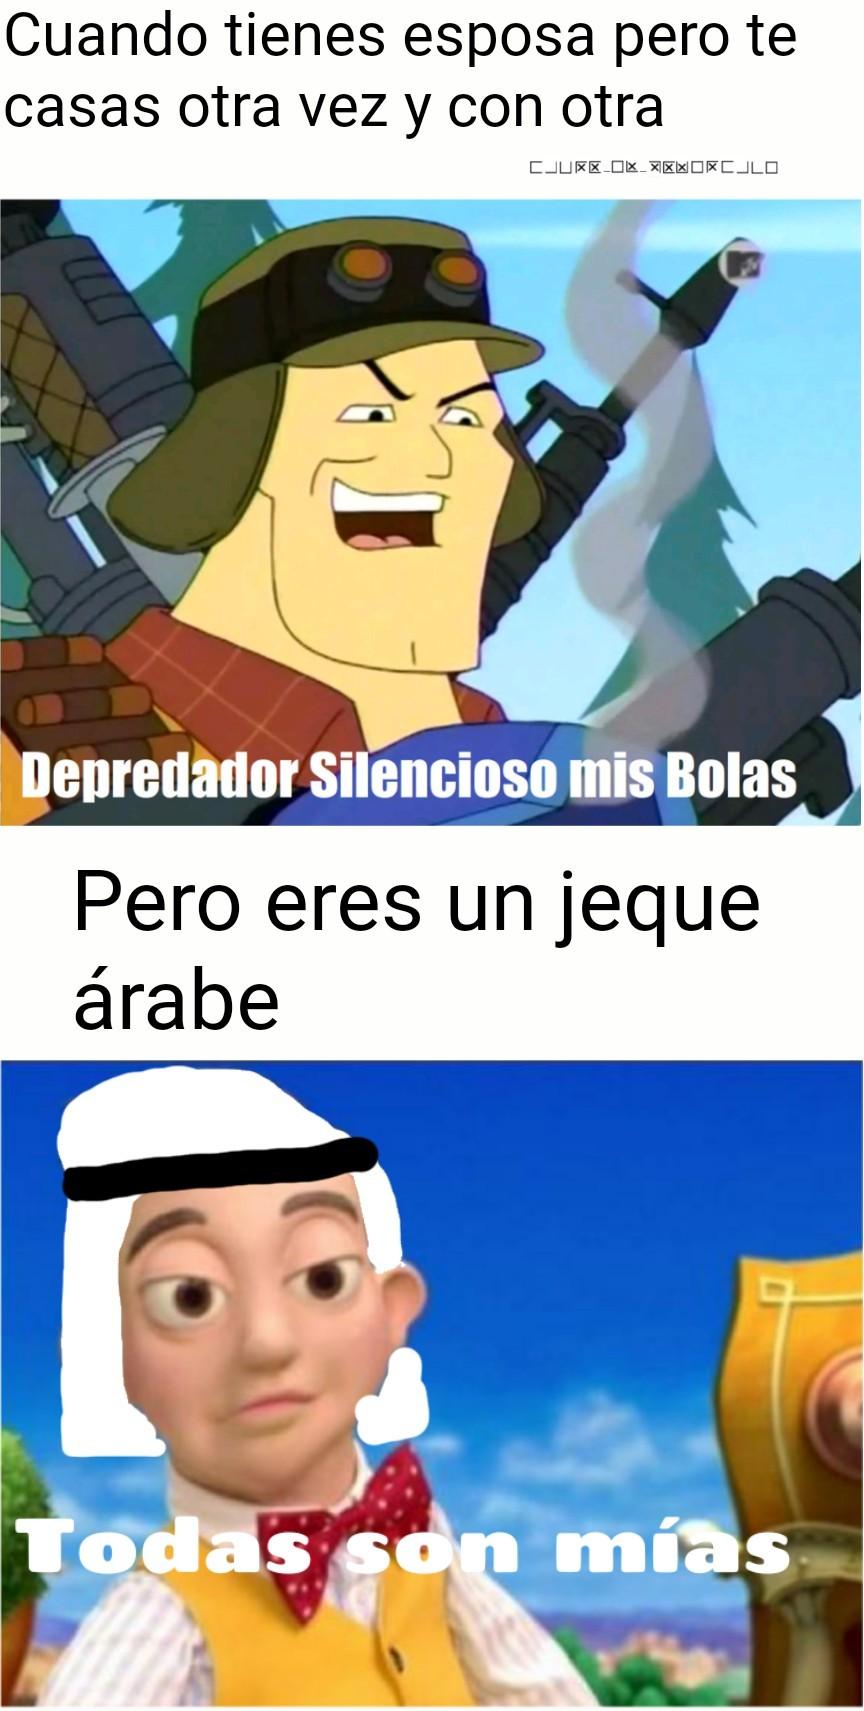 O de Catar - meme